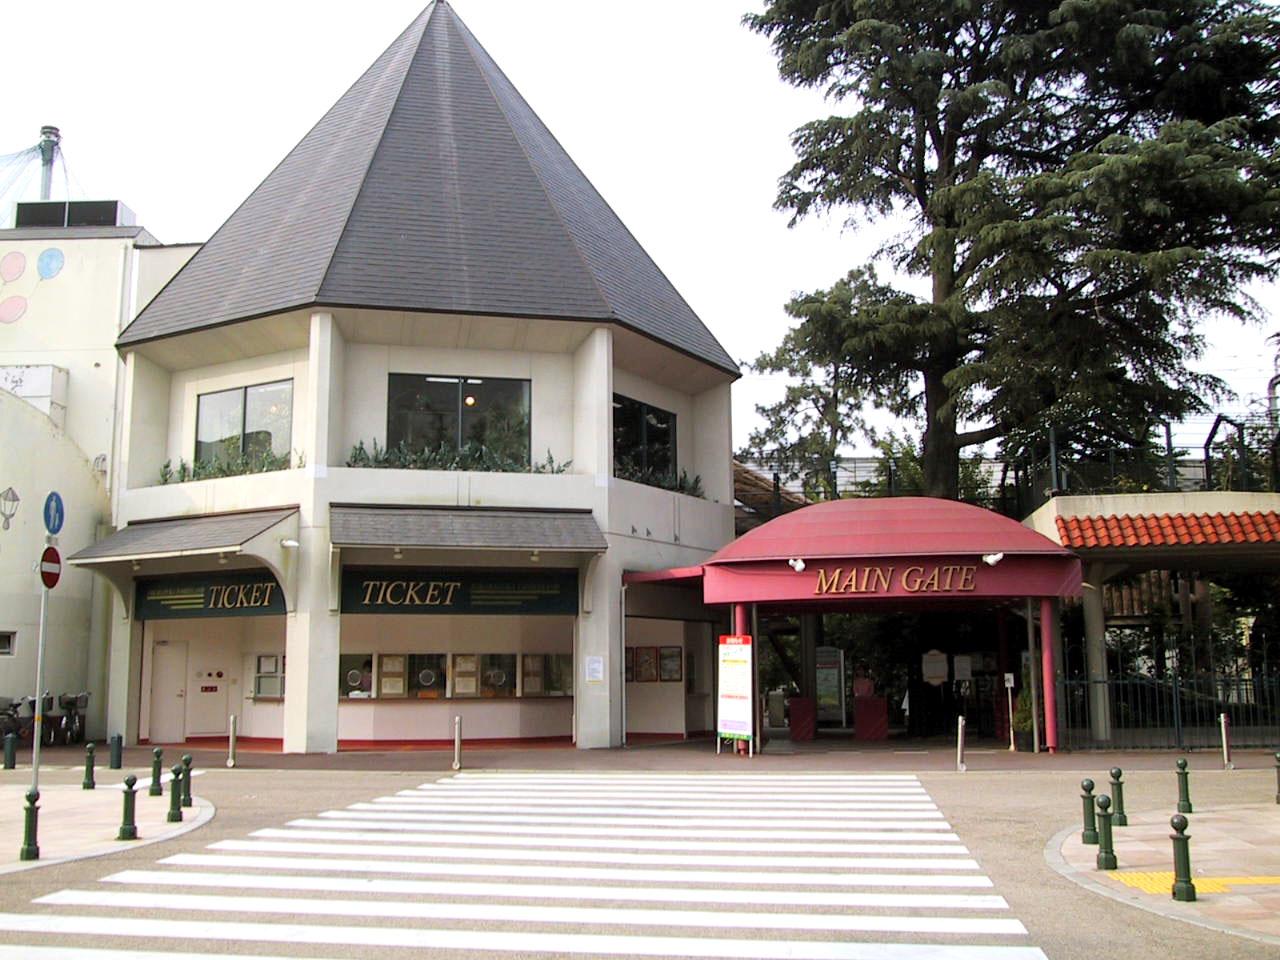 https://upload.wikimedia.org/wikipedia/commons/d/d2/Takarazuka_Family_Land.JPG